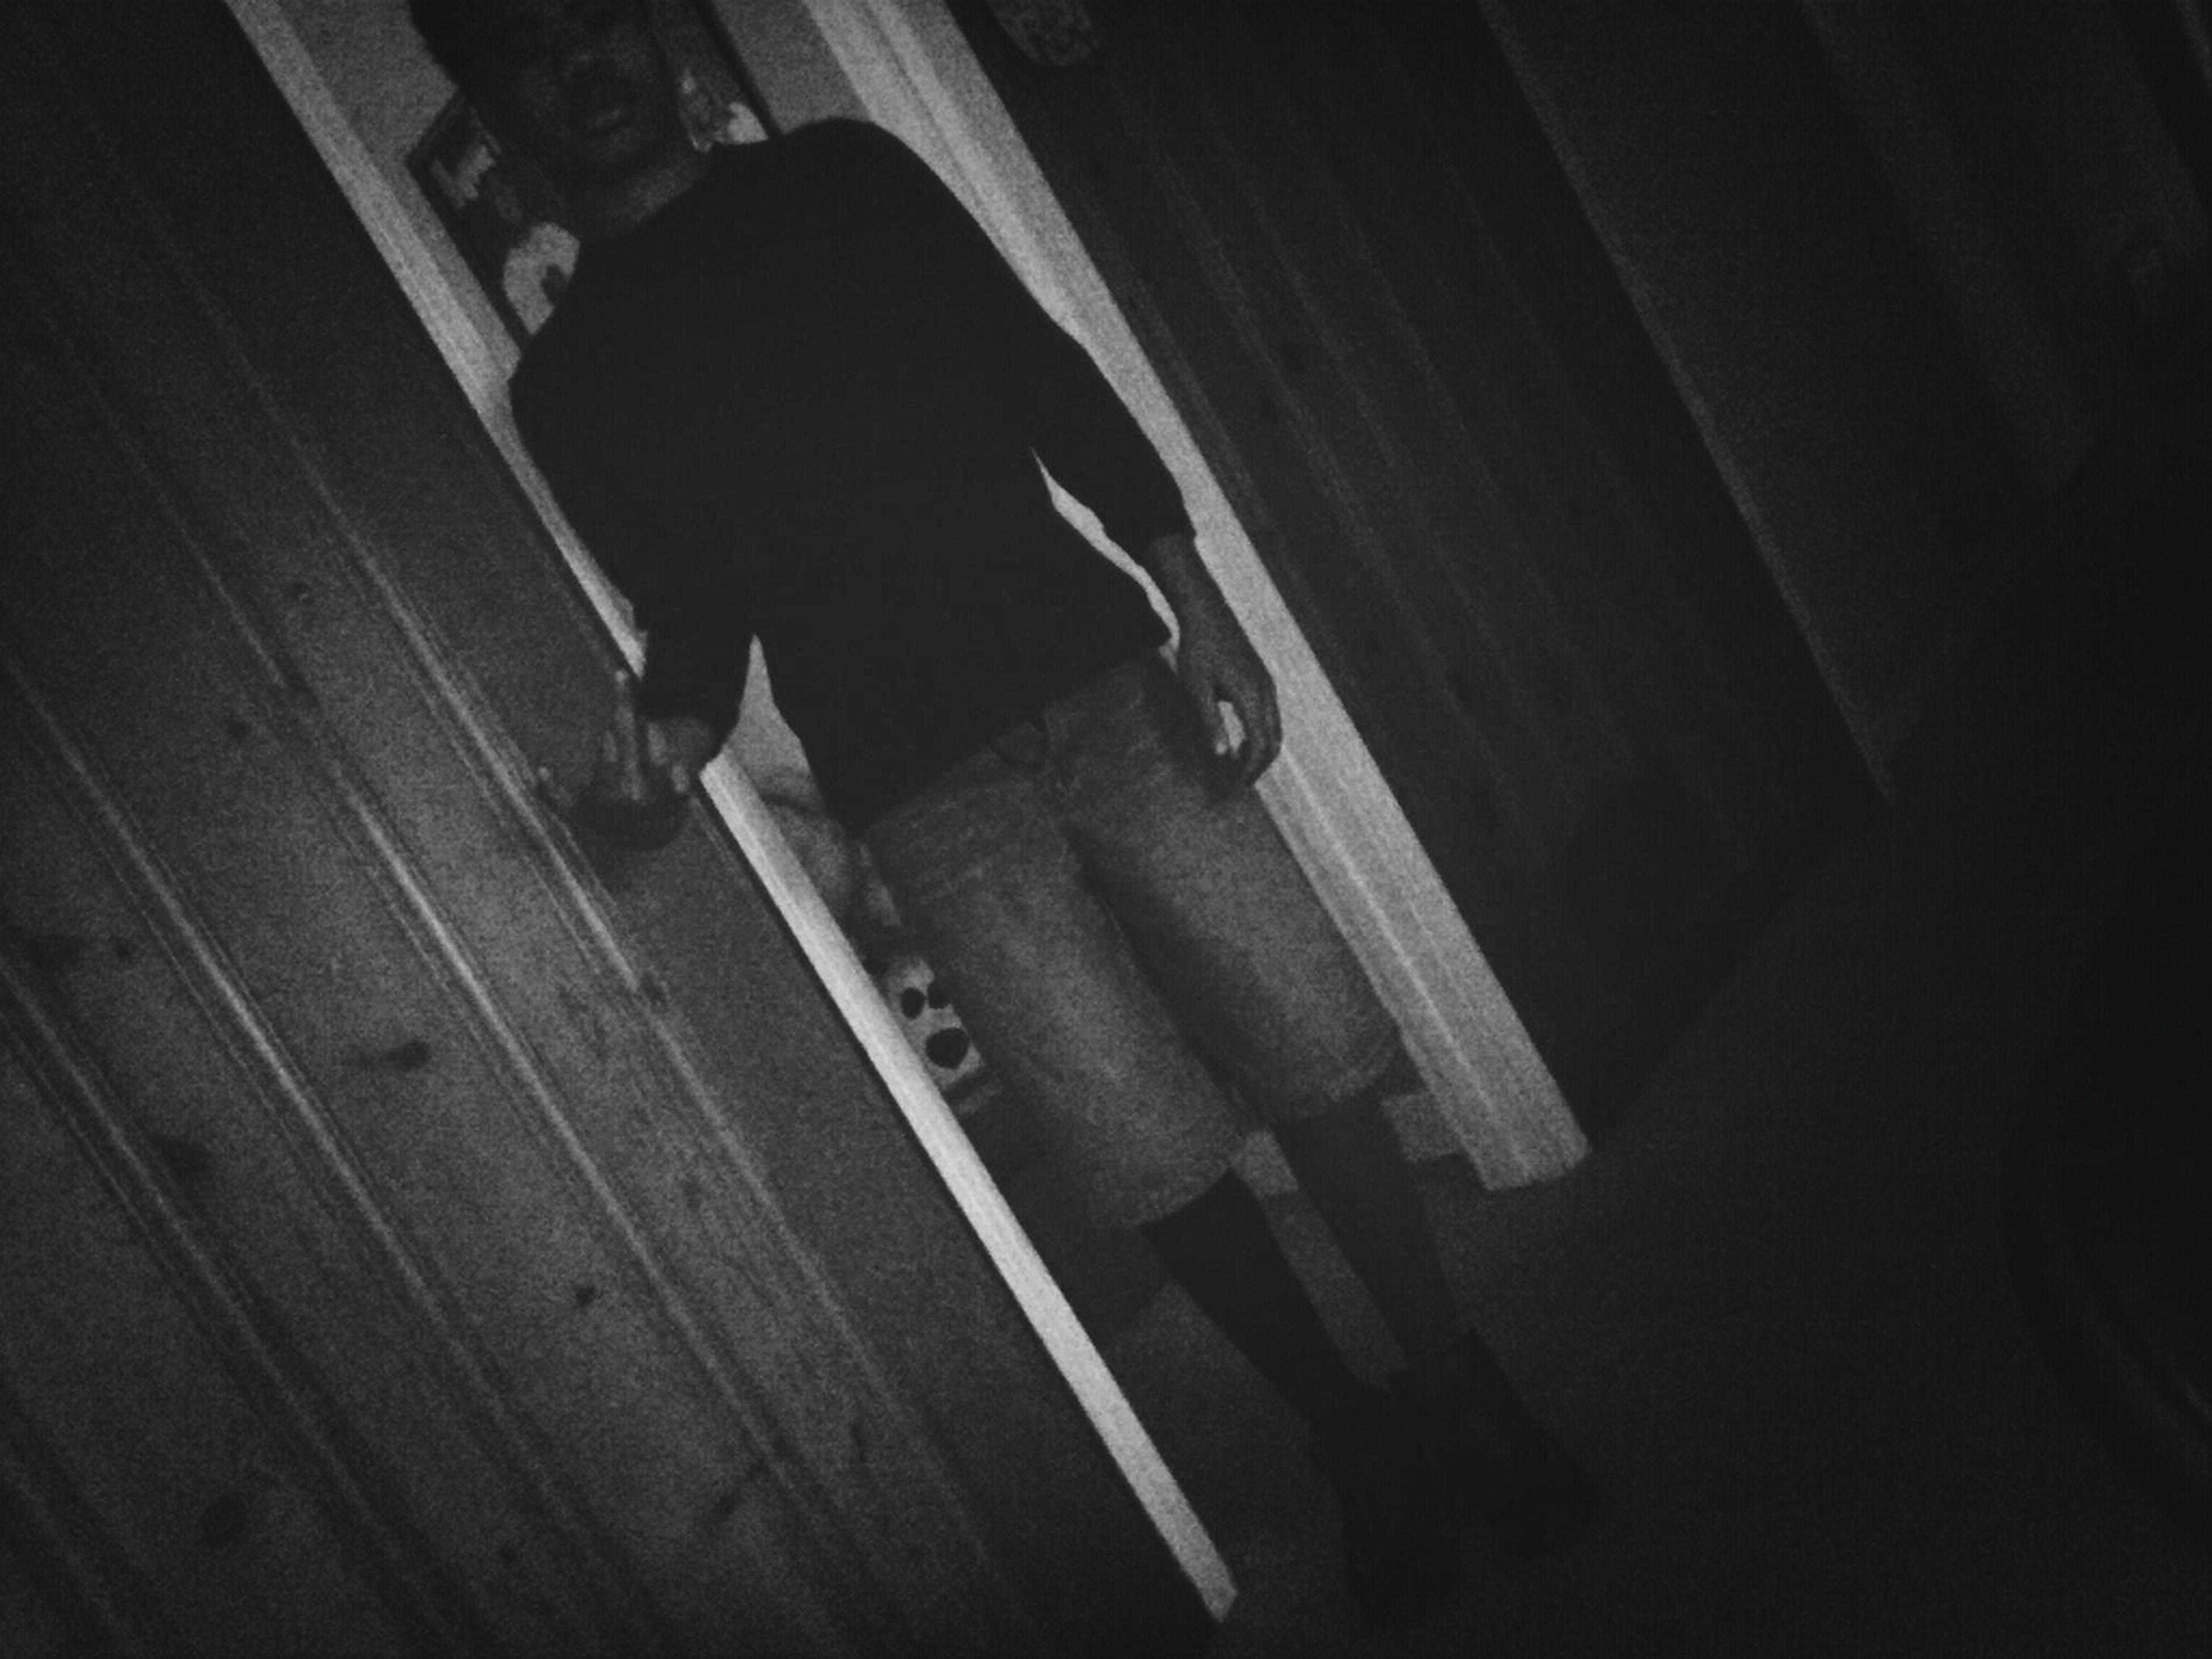 indoors, high angle view, wood - material, shadow, night, sunlight, wooden, animal themes, flooring, door, dark, wall - building feature, wood, full length, one animal, hardwood floor